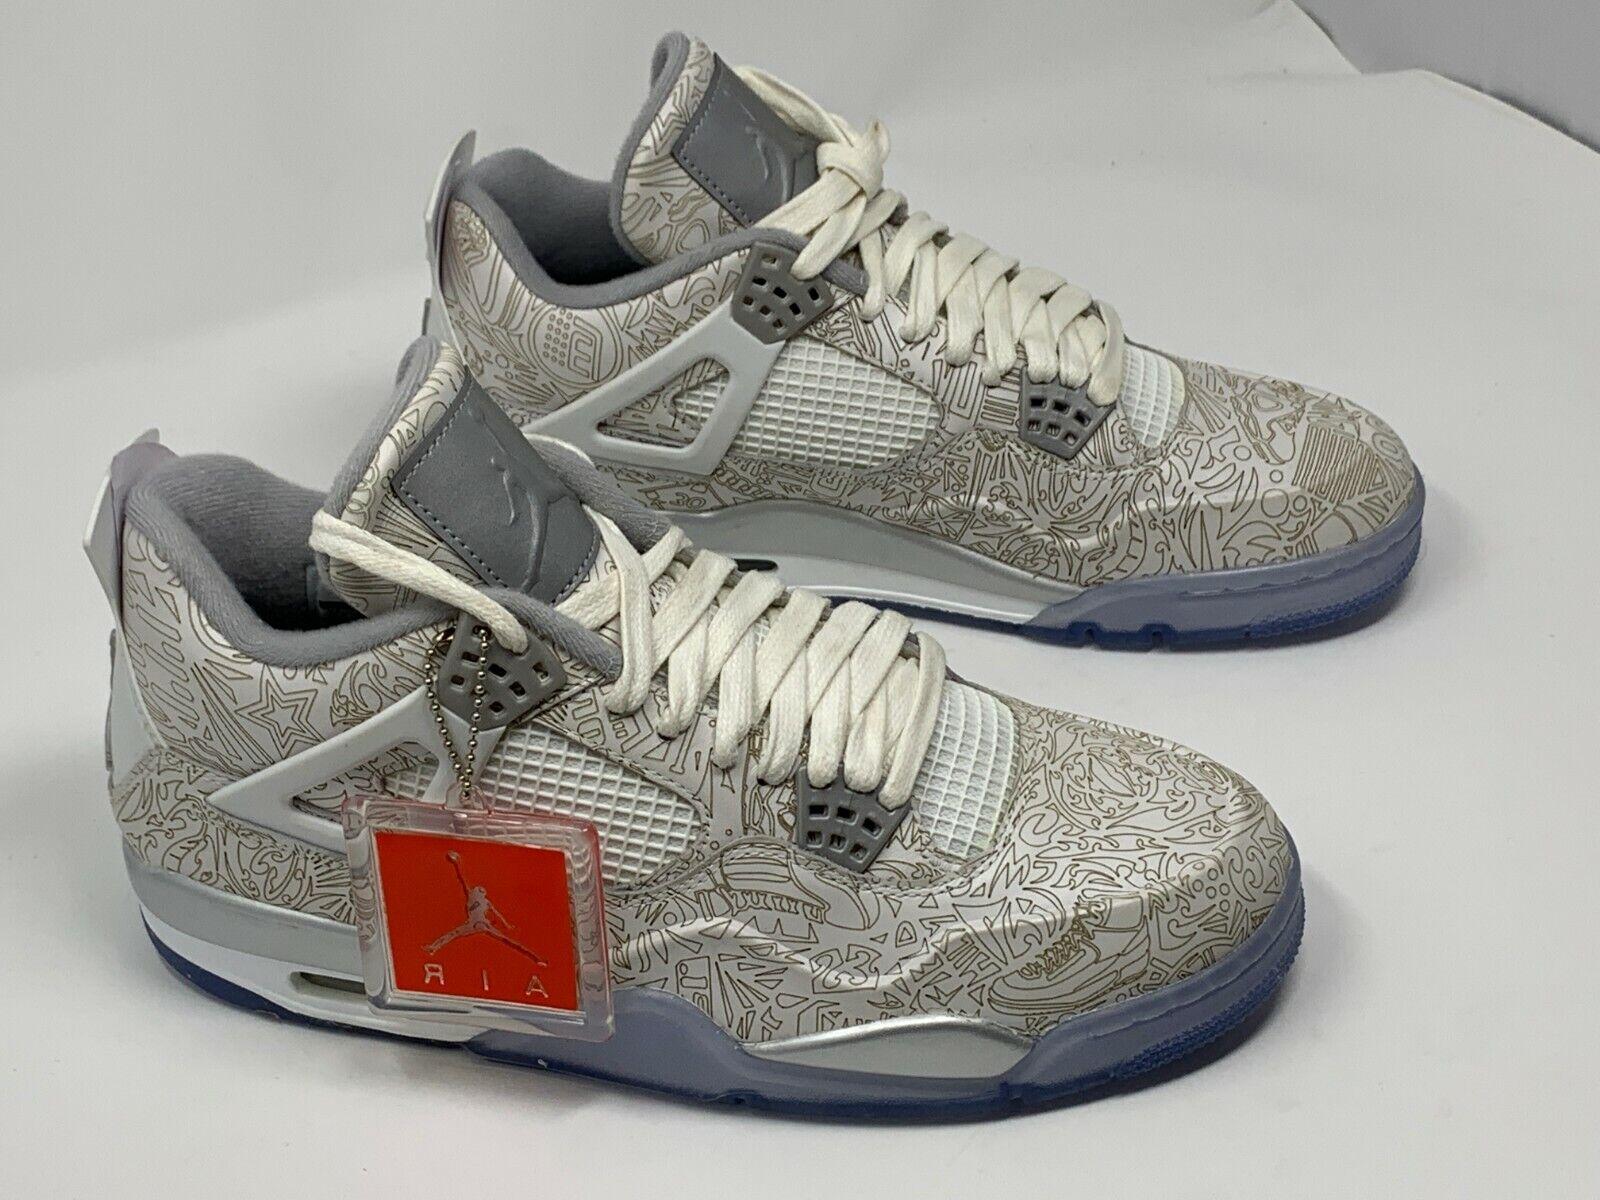 Nike AIR JORDAN 4 RETRO LASER  705333 105 SZ 10.5